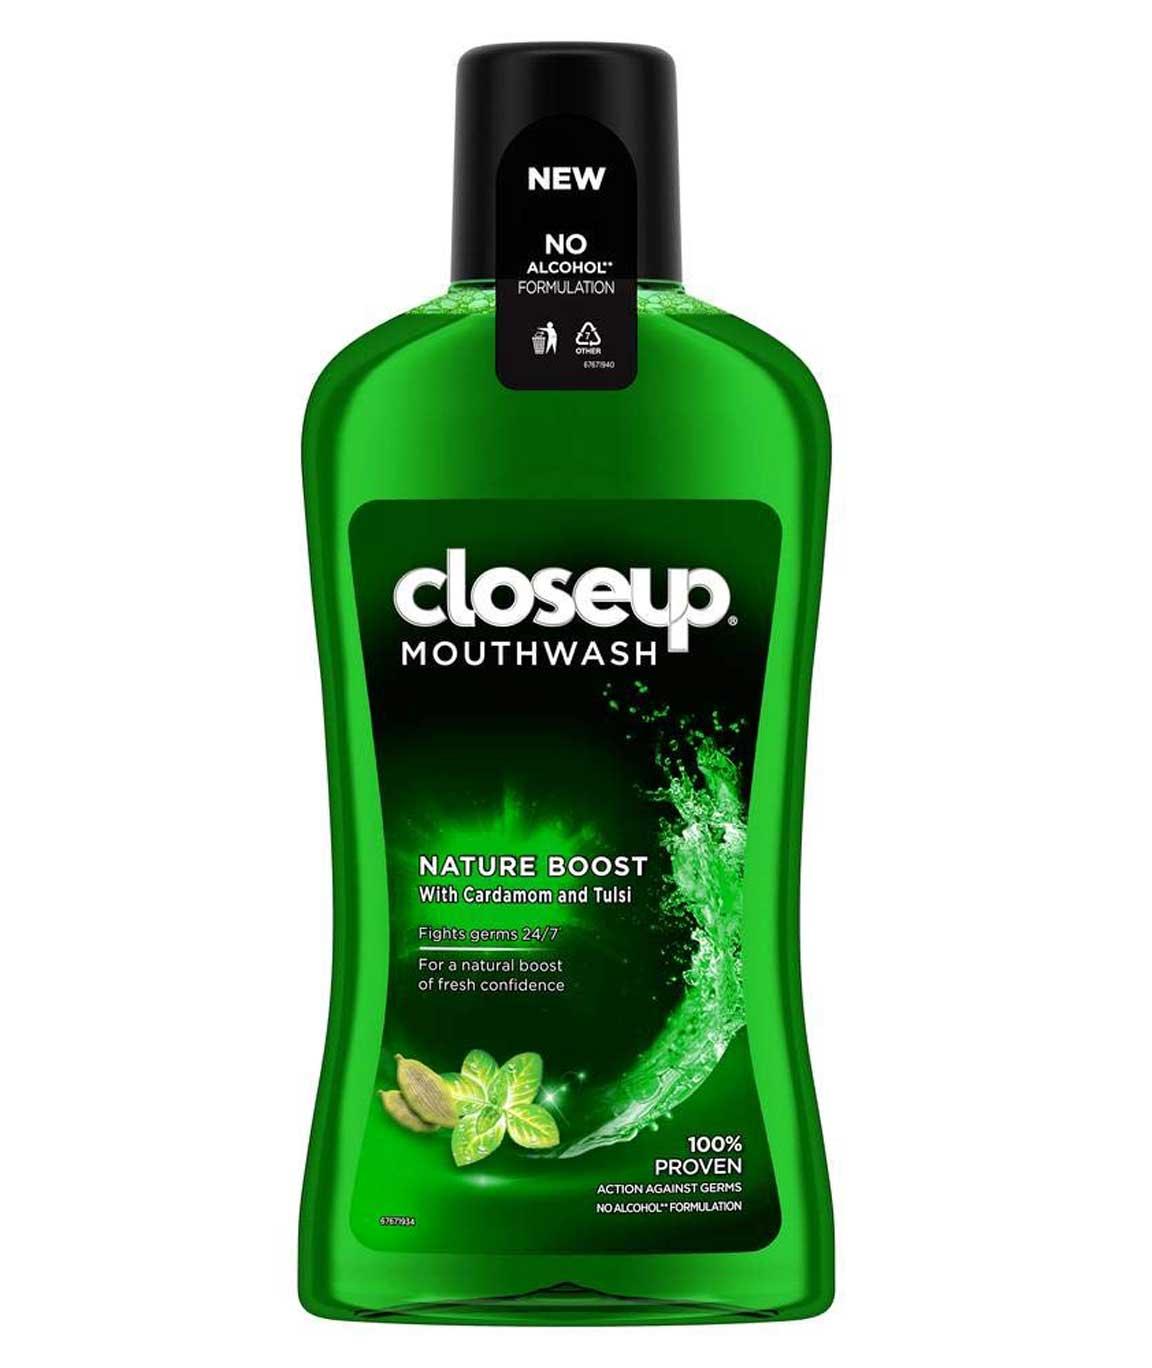 Closeup Nature Boost Mouthwash - 500 ml